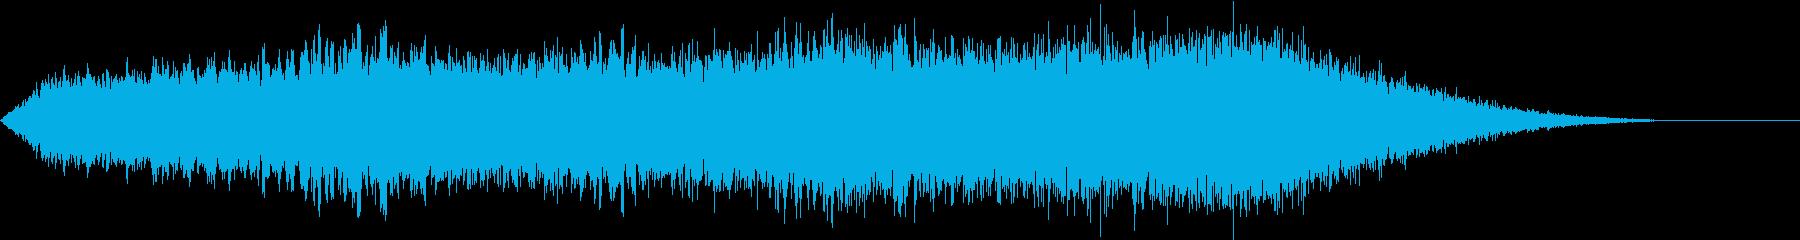 CINEMATIC RISER_29の再生済みの波形